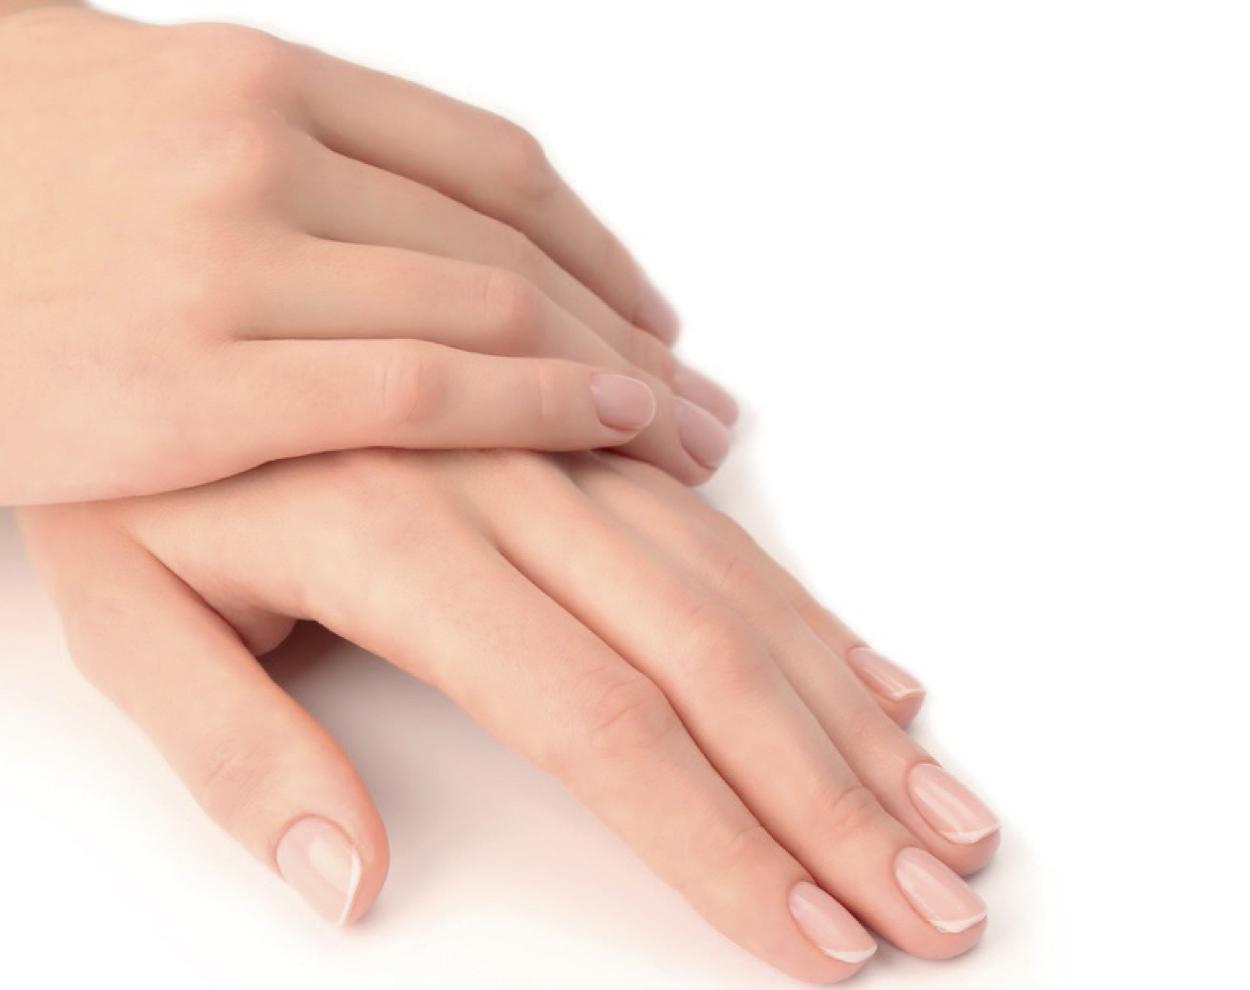 Manicure perfetta: 5 mosse per proteggere le unghie naturali